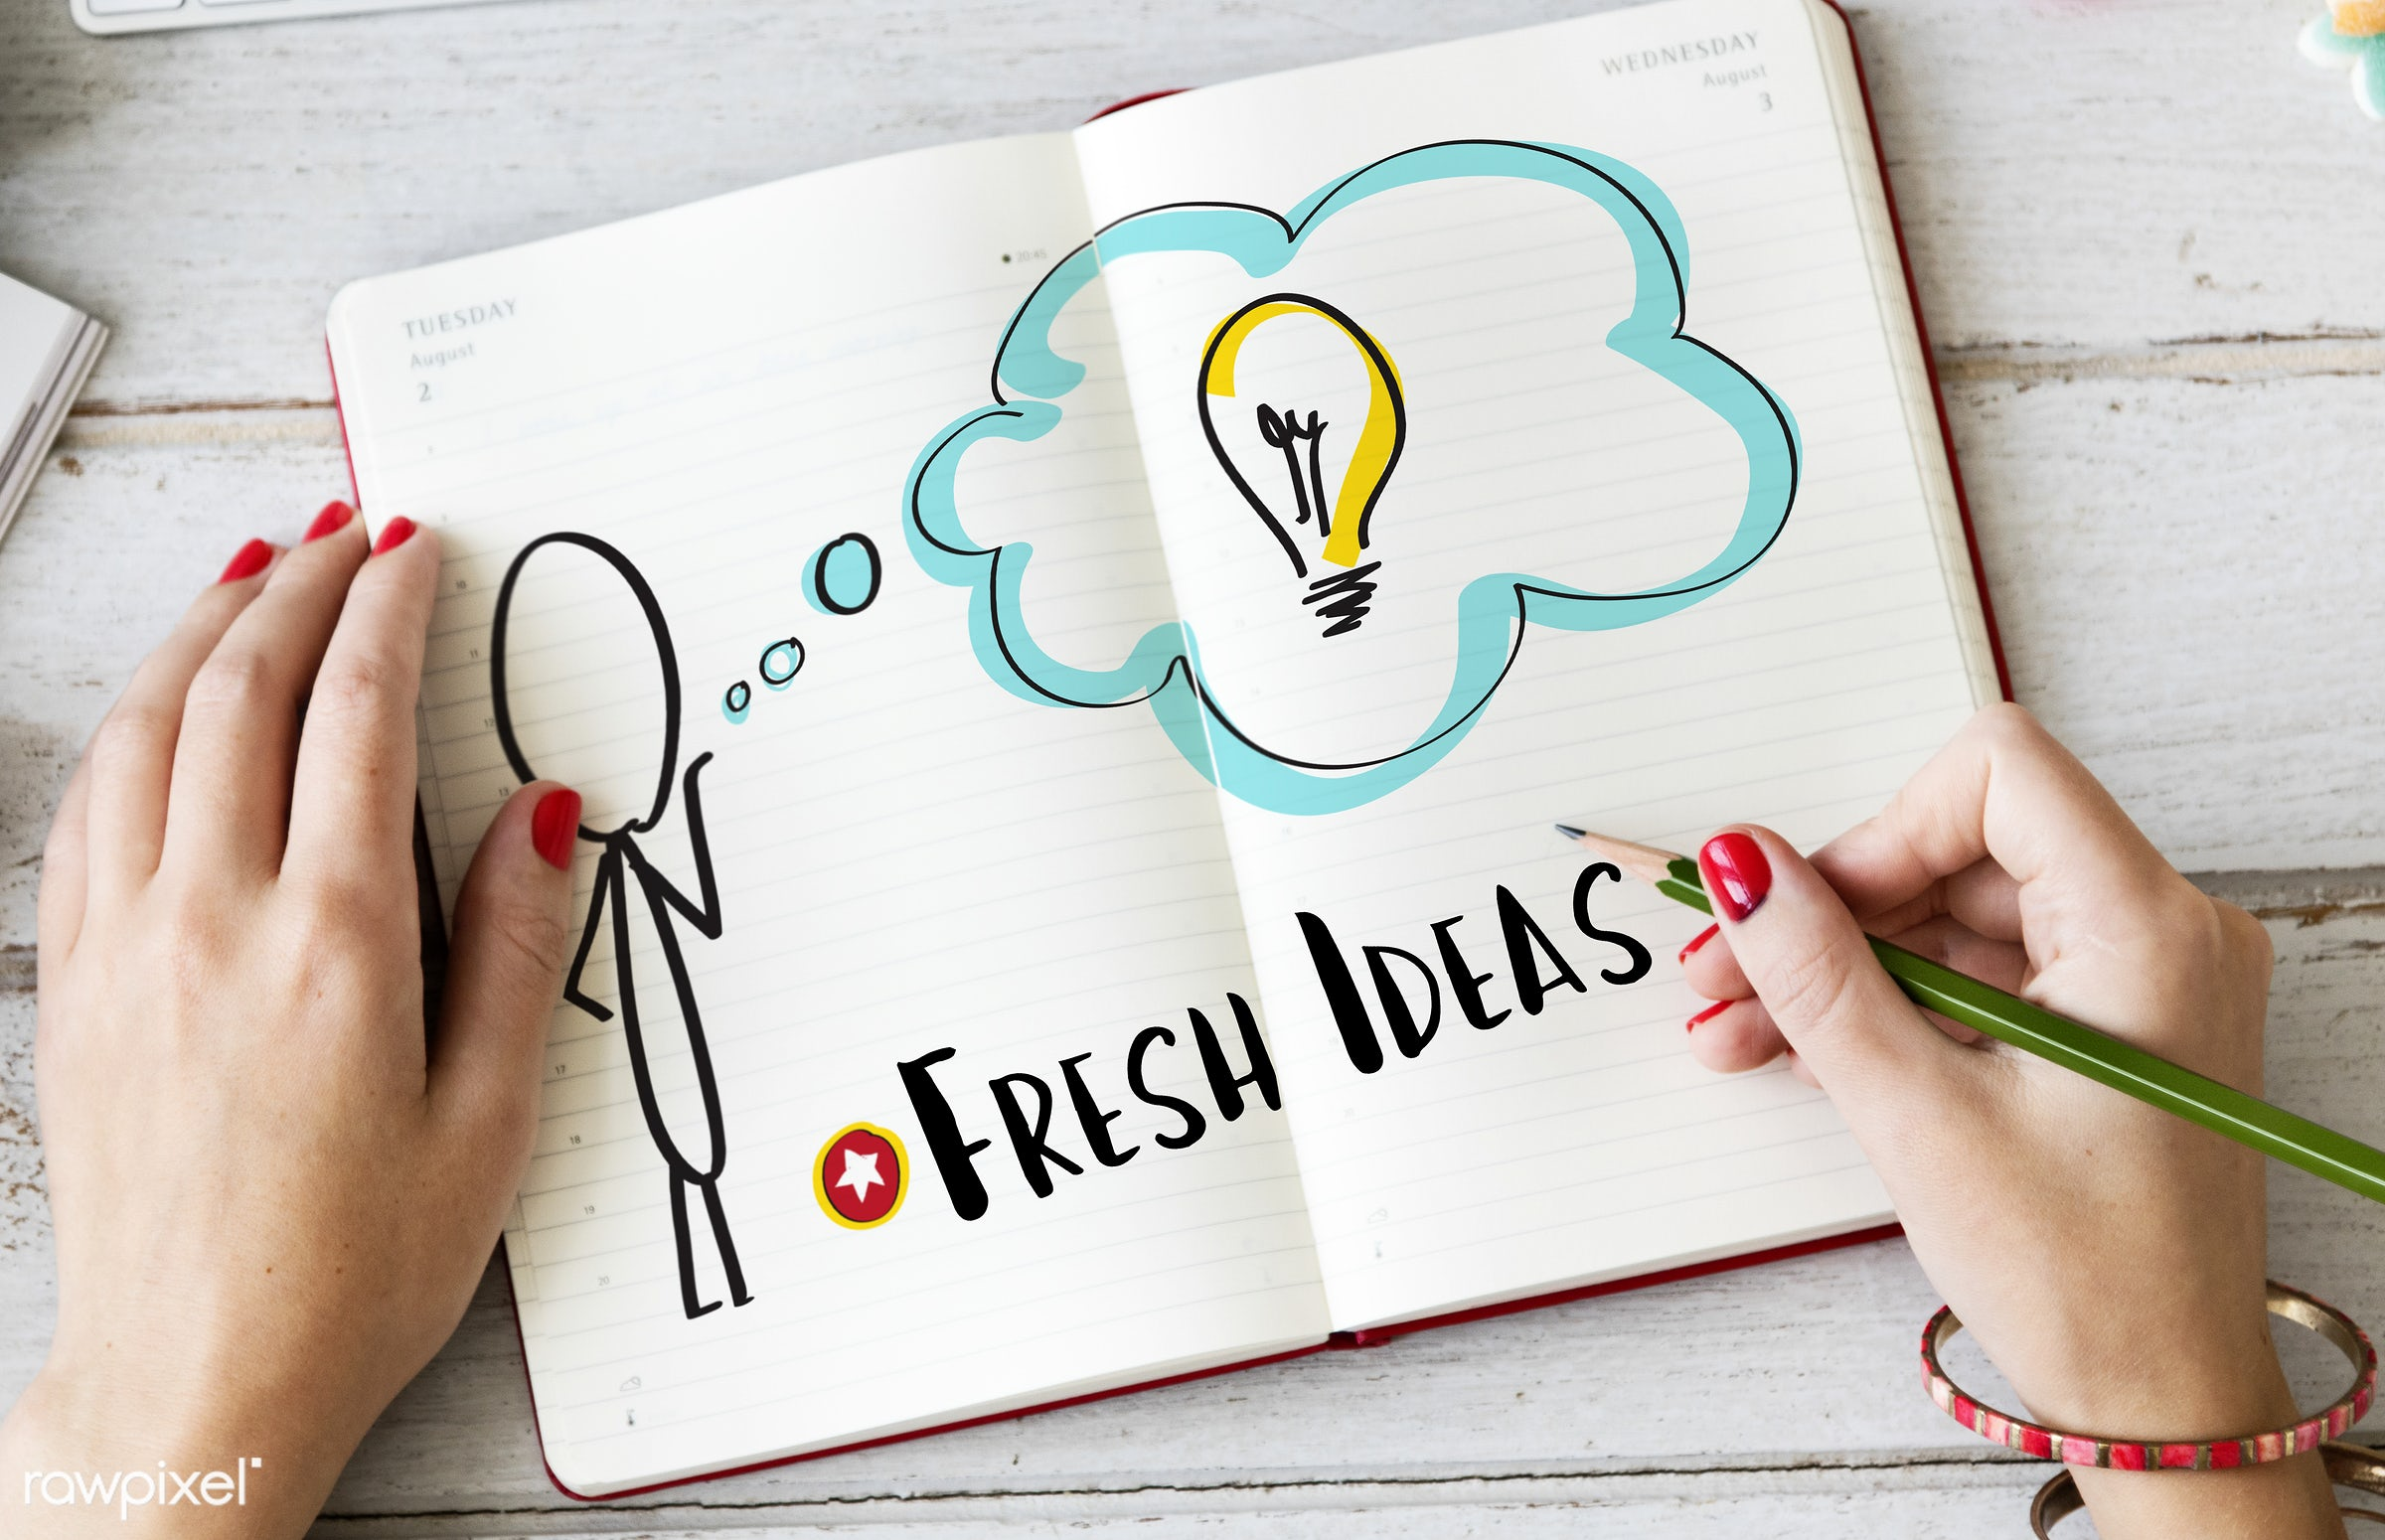 aerial, book, caucasian, closeup, communication, creative, diary, hands, idea, ideas, journal, leisure, memory, notebook,...